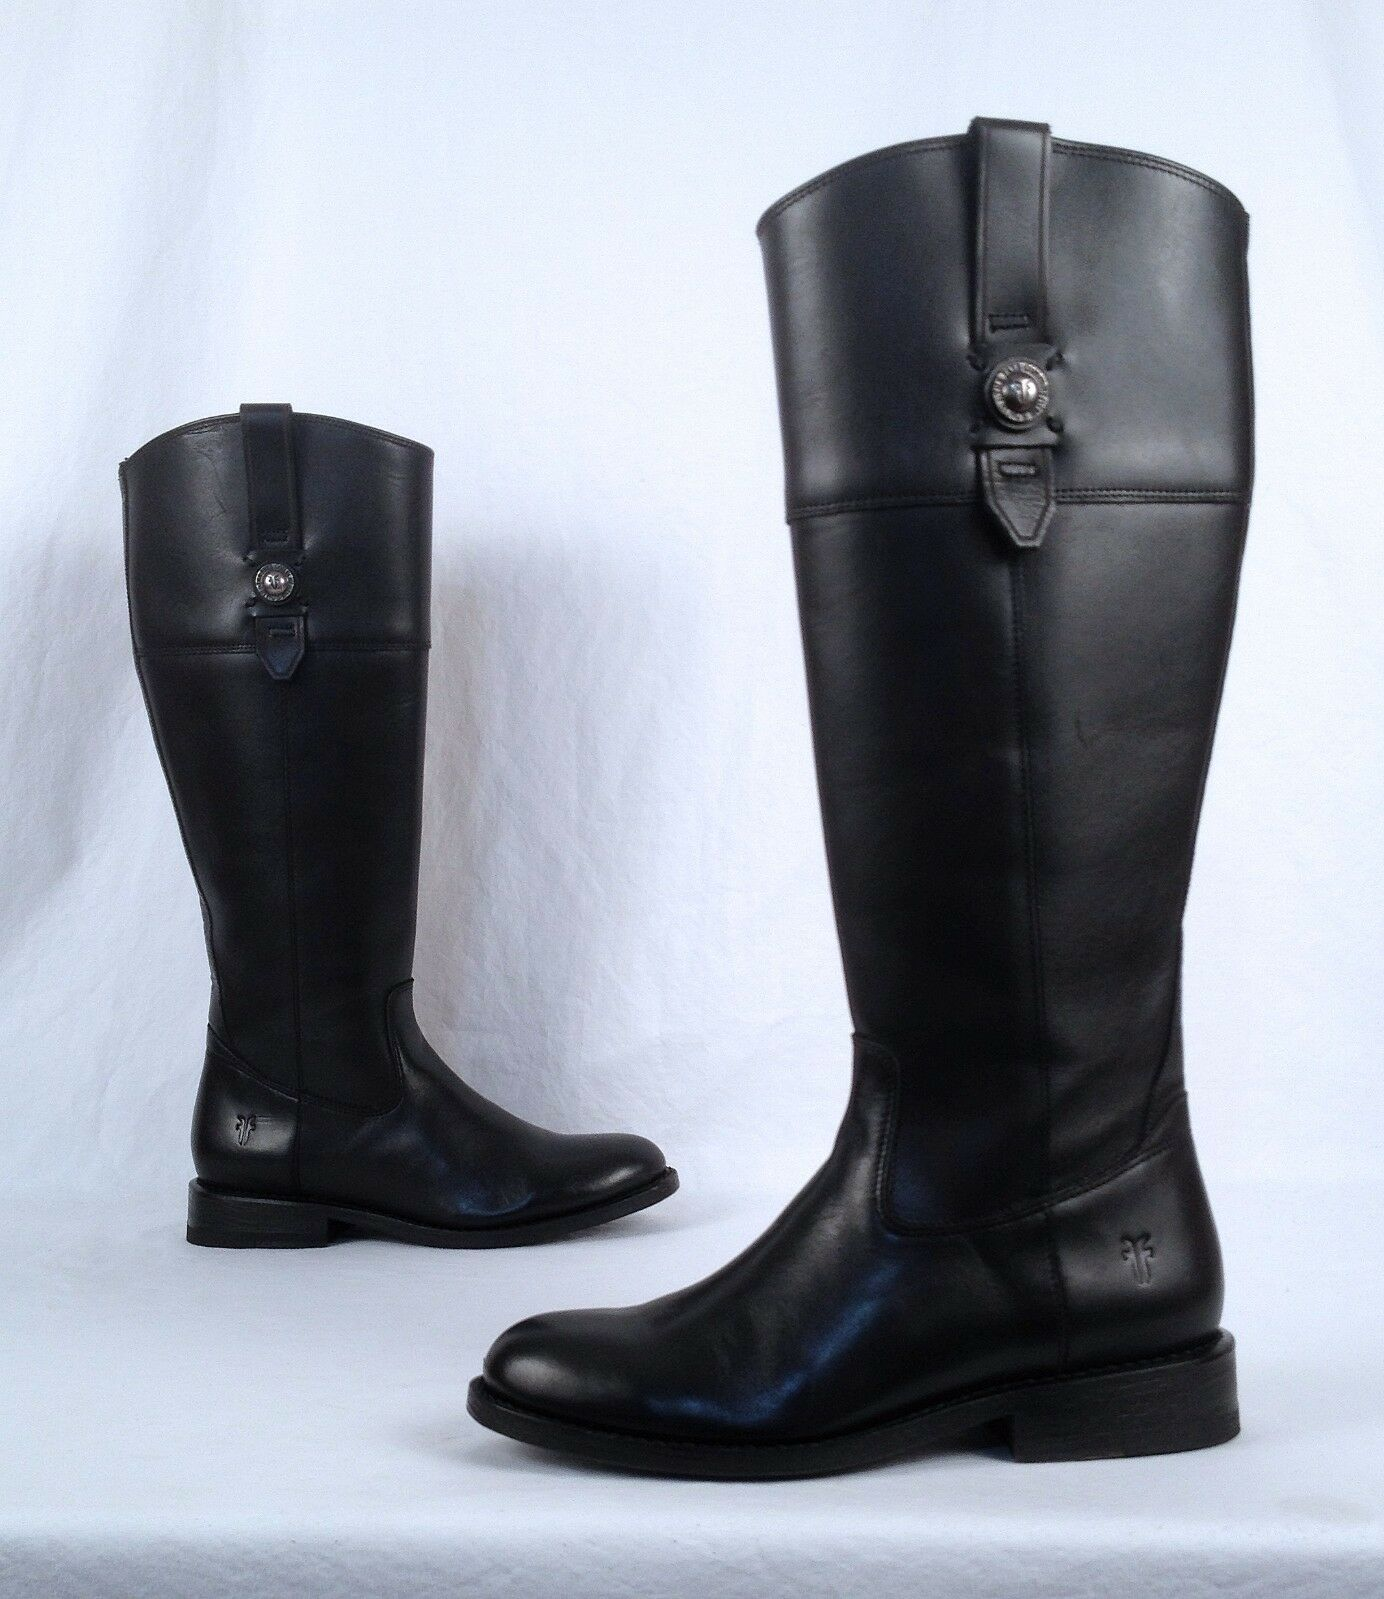 NEW   Frye 'Jayden Button' Tall Riding Boot- Black- Size 5.5 B   425 (B80)